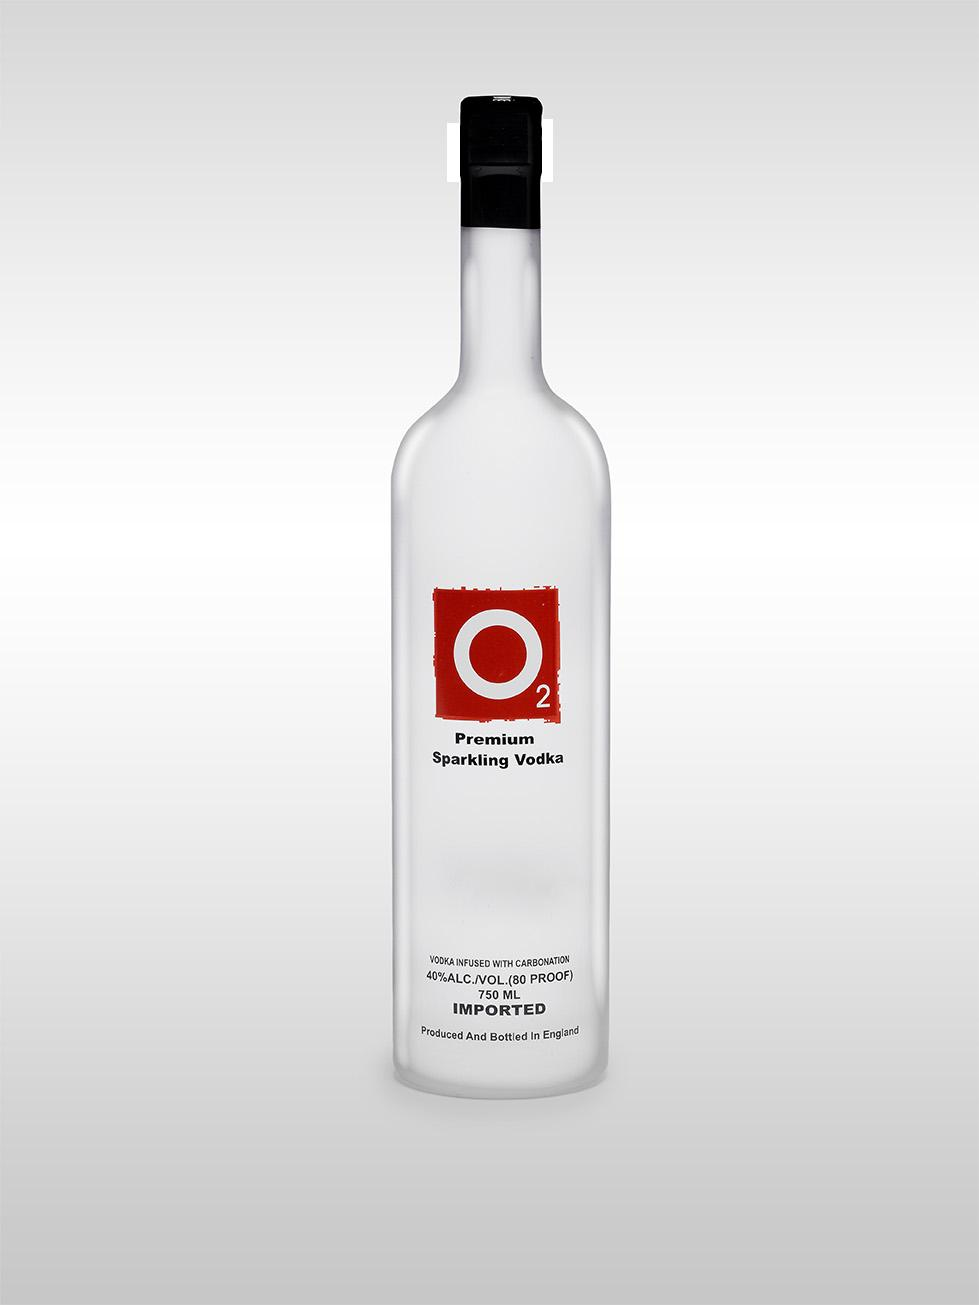 O2 bottle